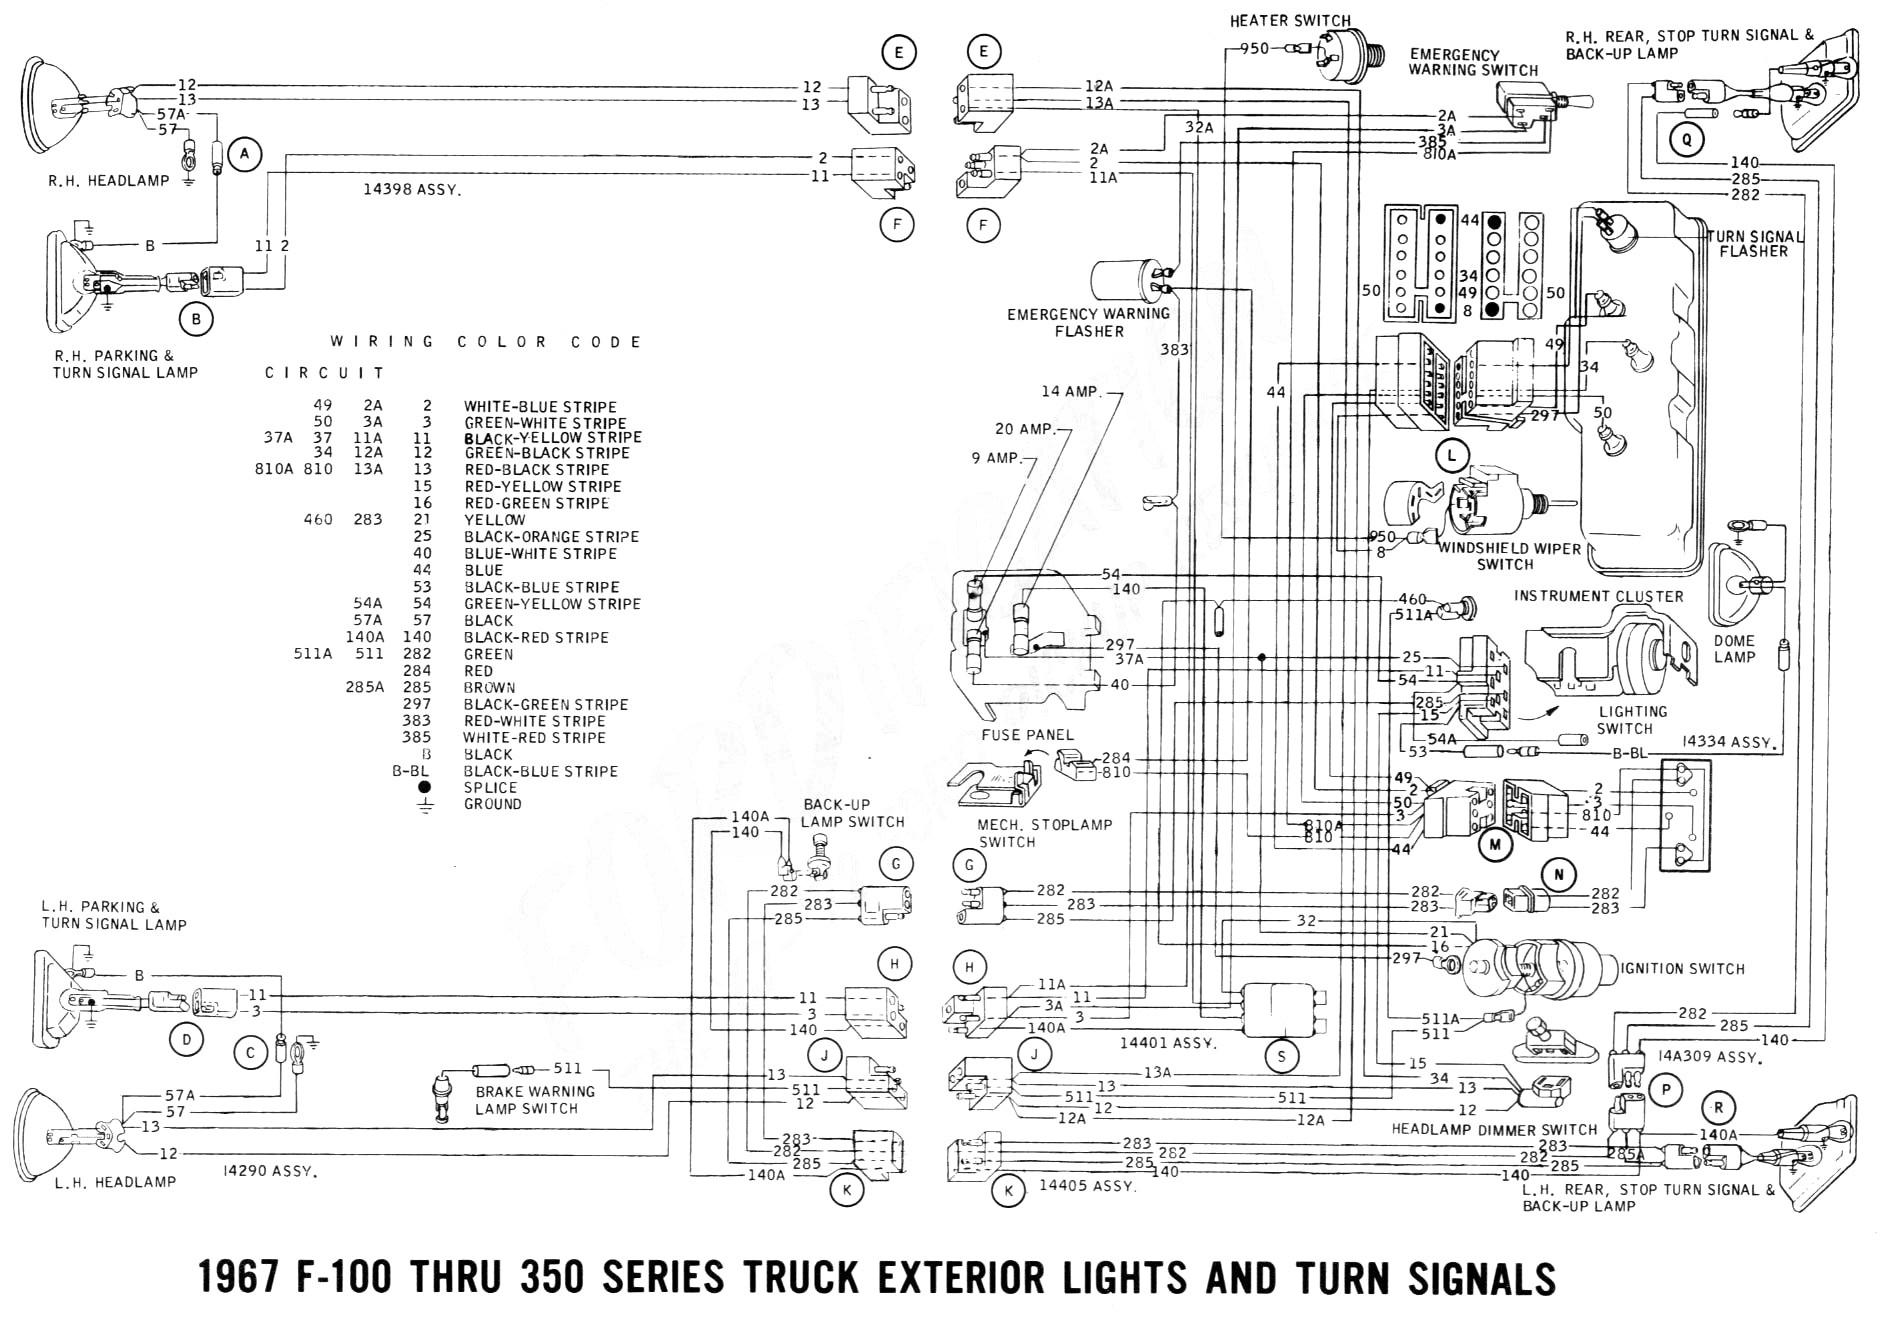 ford f350 1986 ignition wiring diagram 1986 ford f350 wiring rh residentevil me BMW E36 Wiring Diagrams 2000 BMW 323I Wiring Diagram